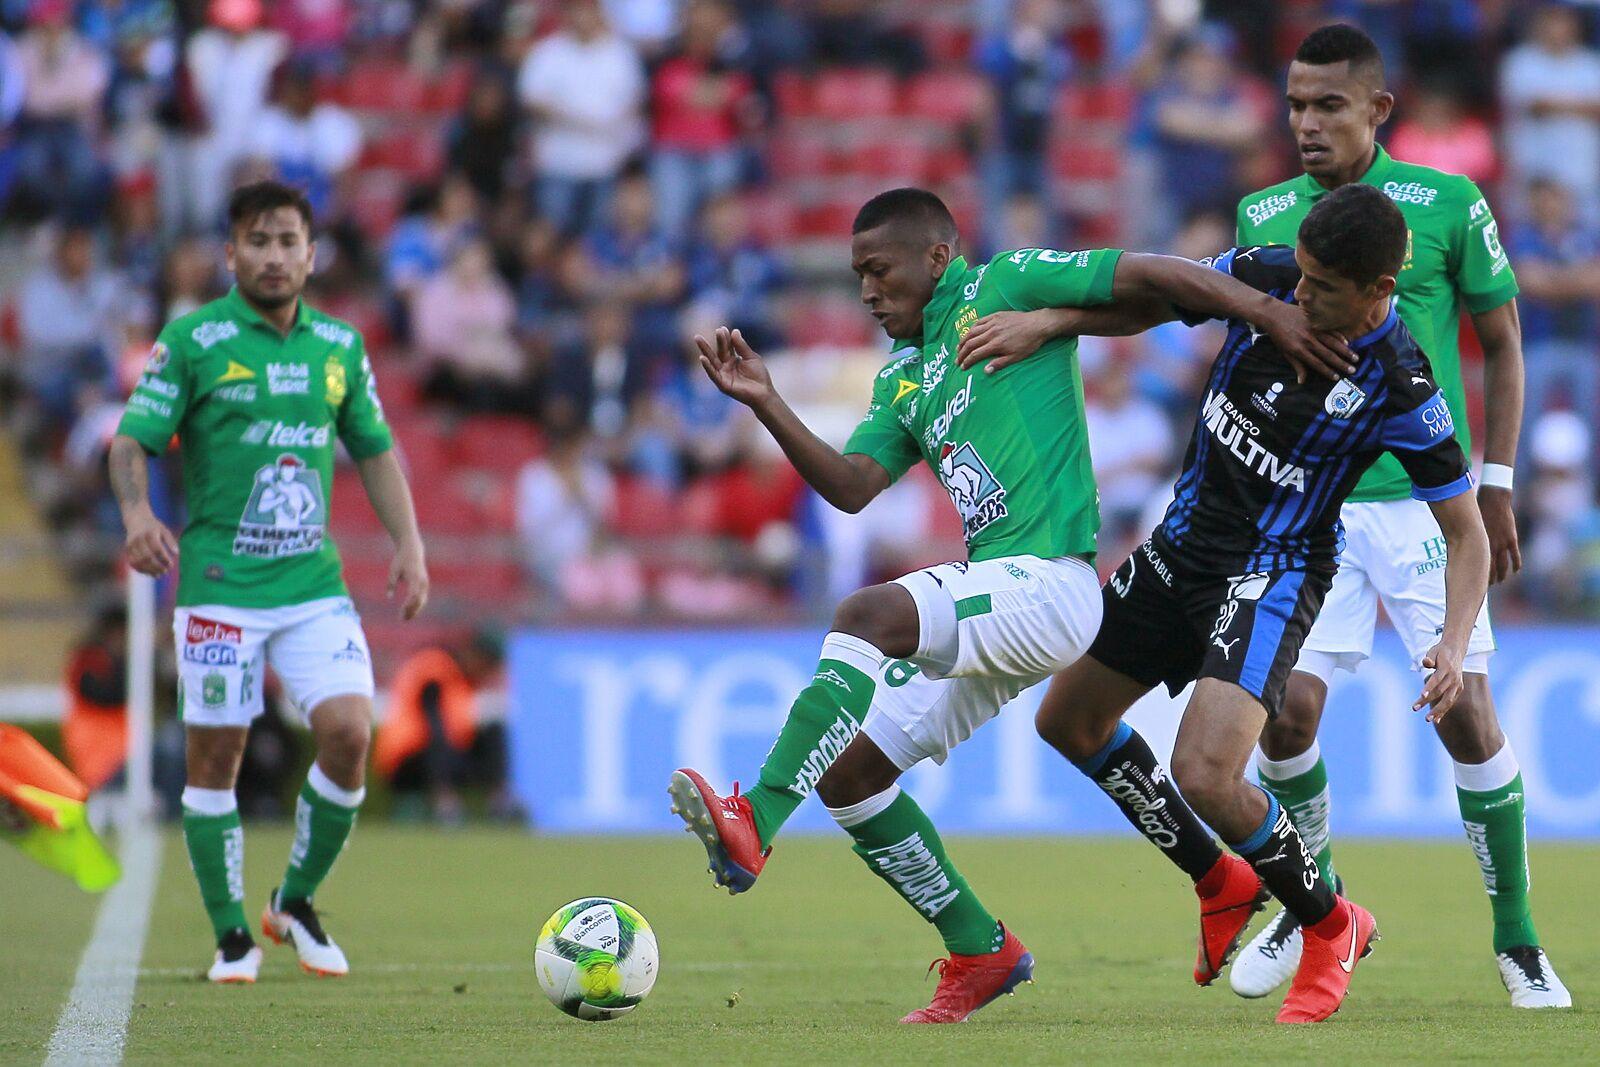 Week 6: League-leading Queretaro welcomes inconsistent Leon